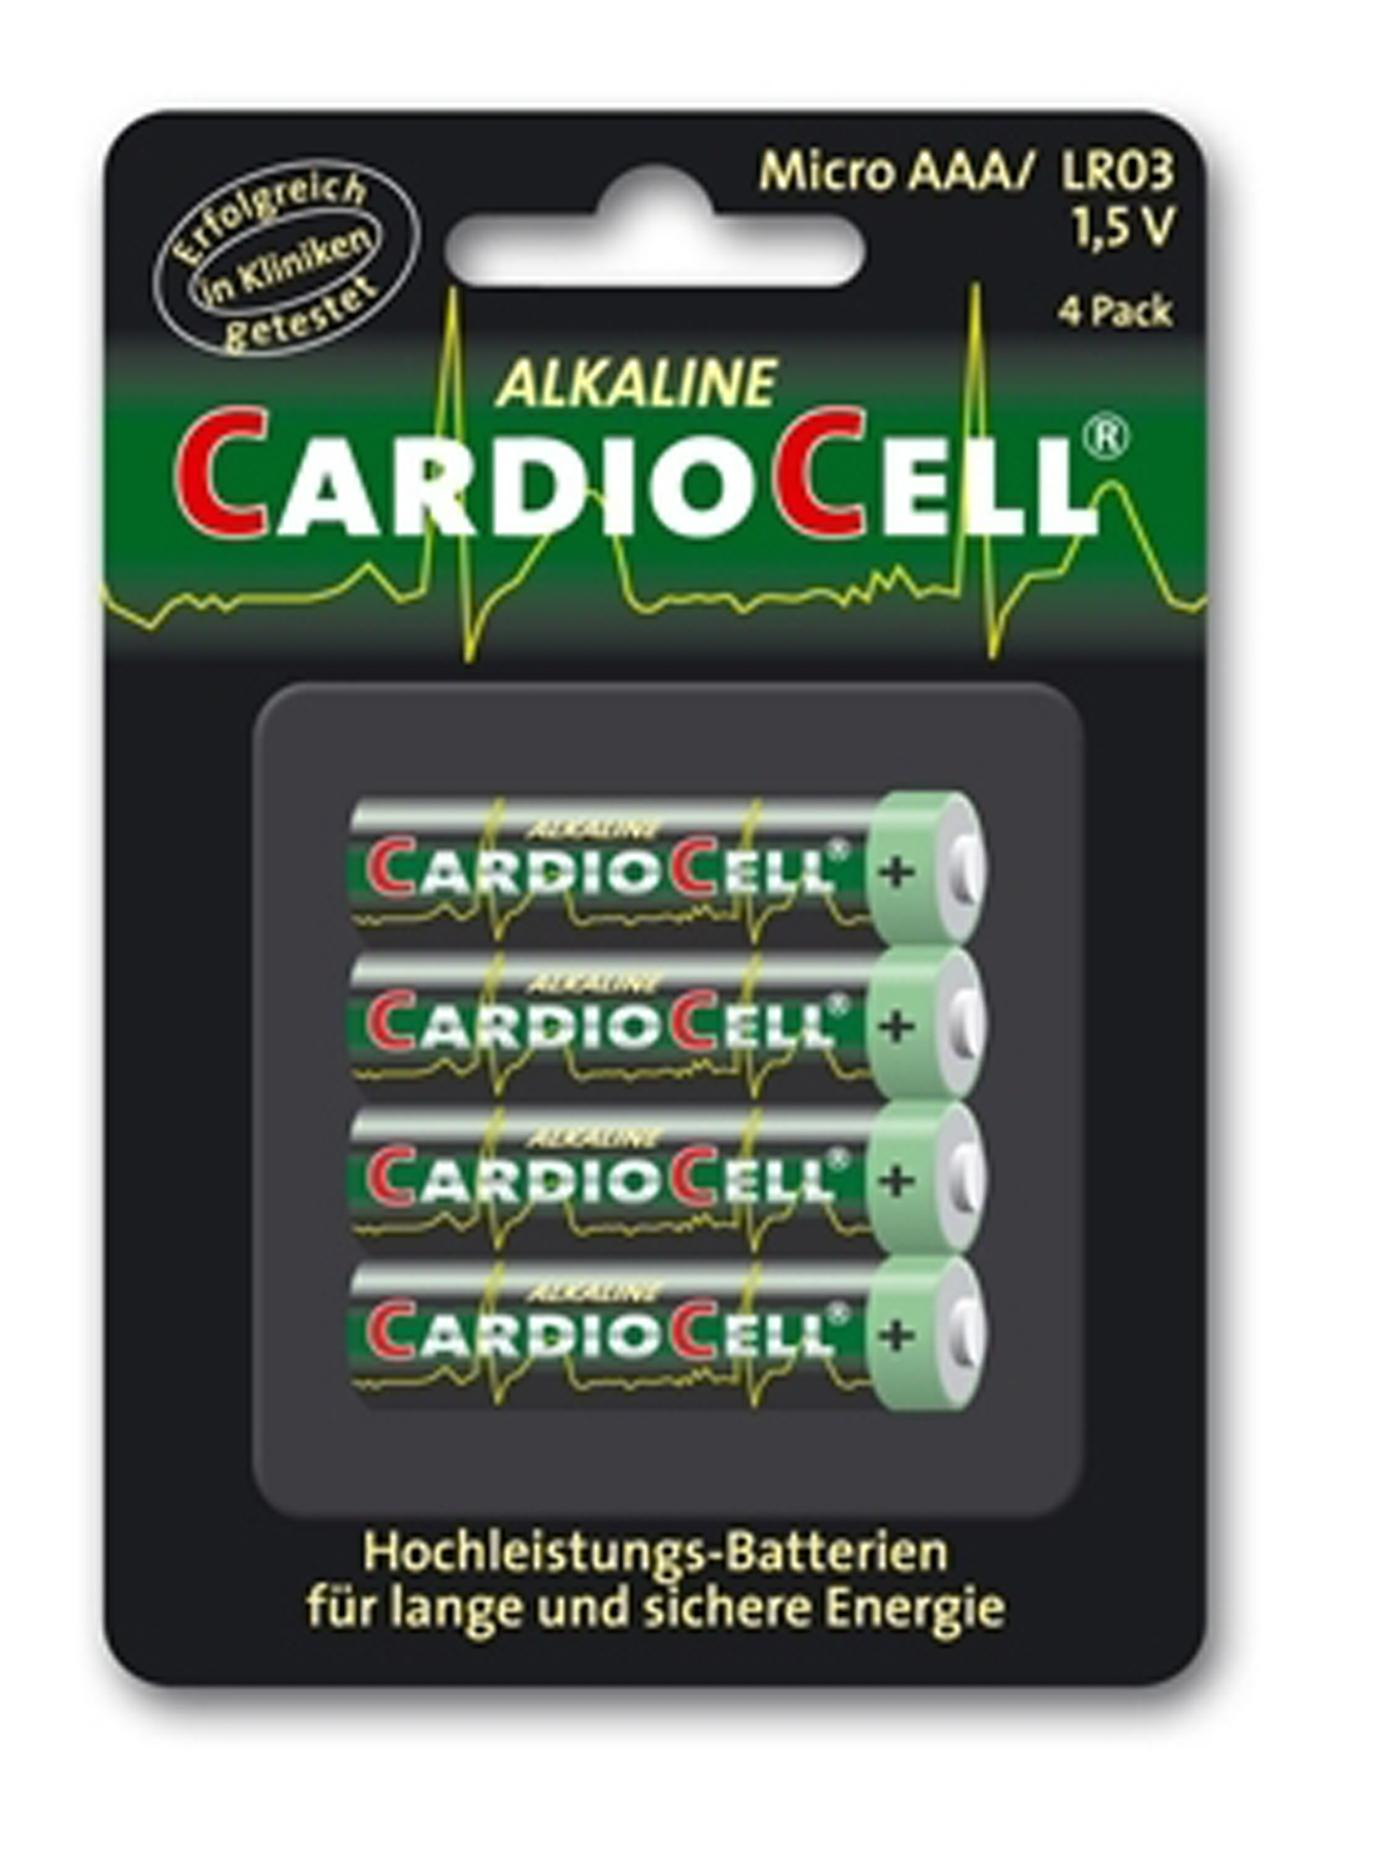 Lot de 4 piles Cardiocell Micro AAA-LR03